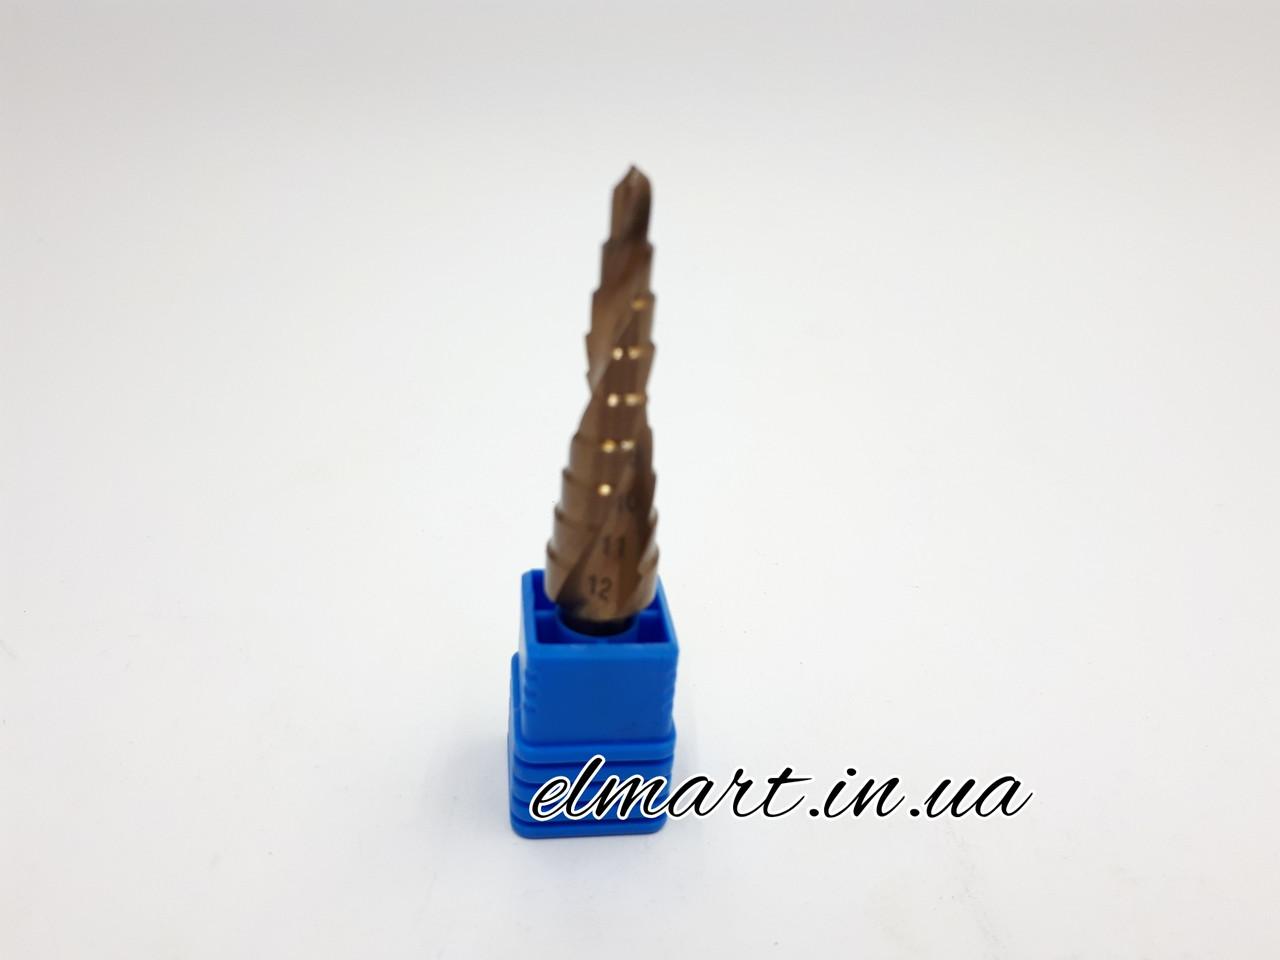 Свердло ступеневу кобальтовое 4-12мм Rapide спіральний профіль шестигранний хвостовик